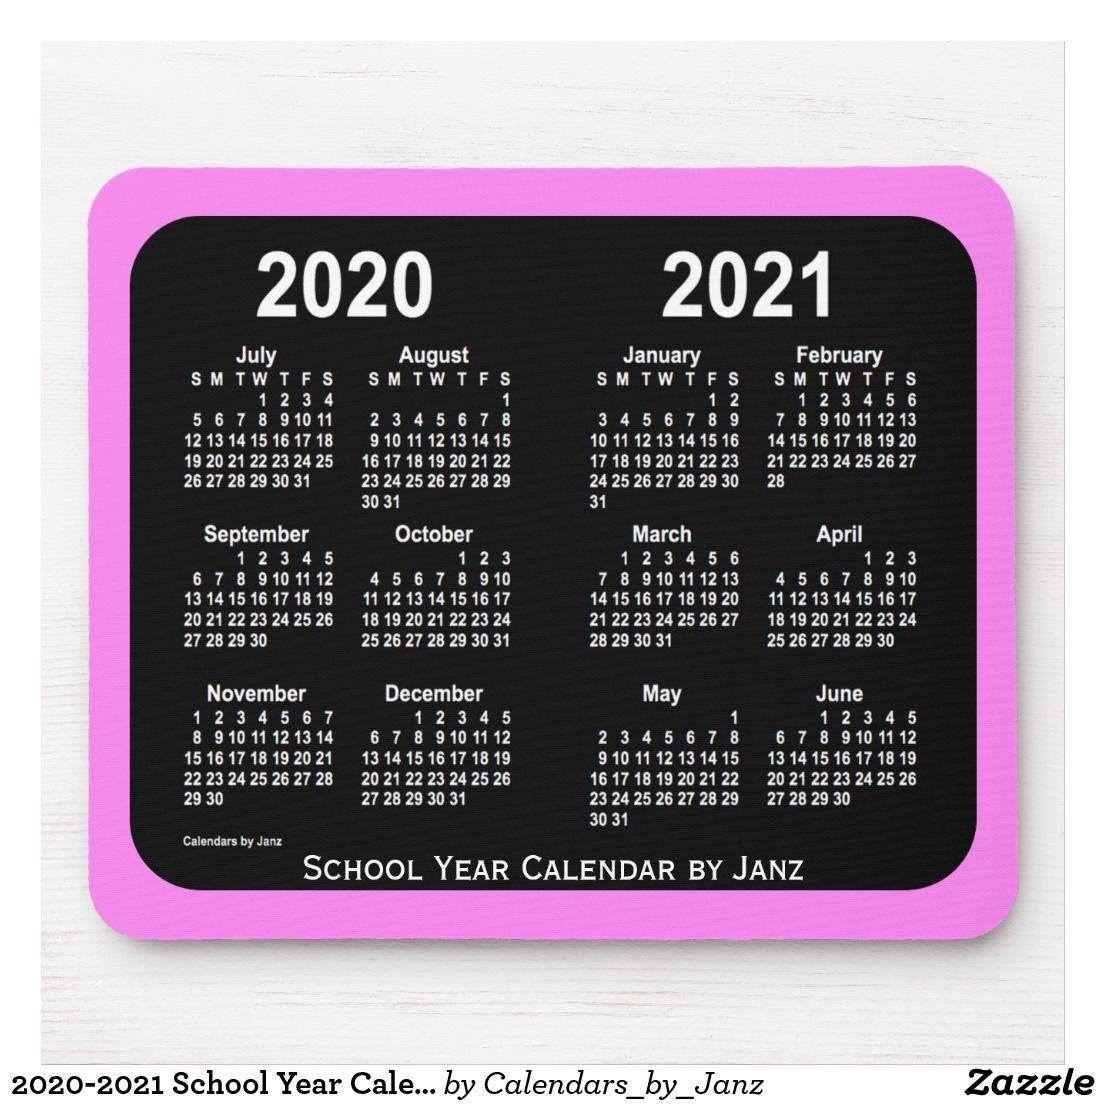 green card prediction july 2021